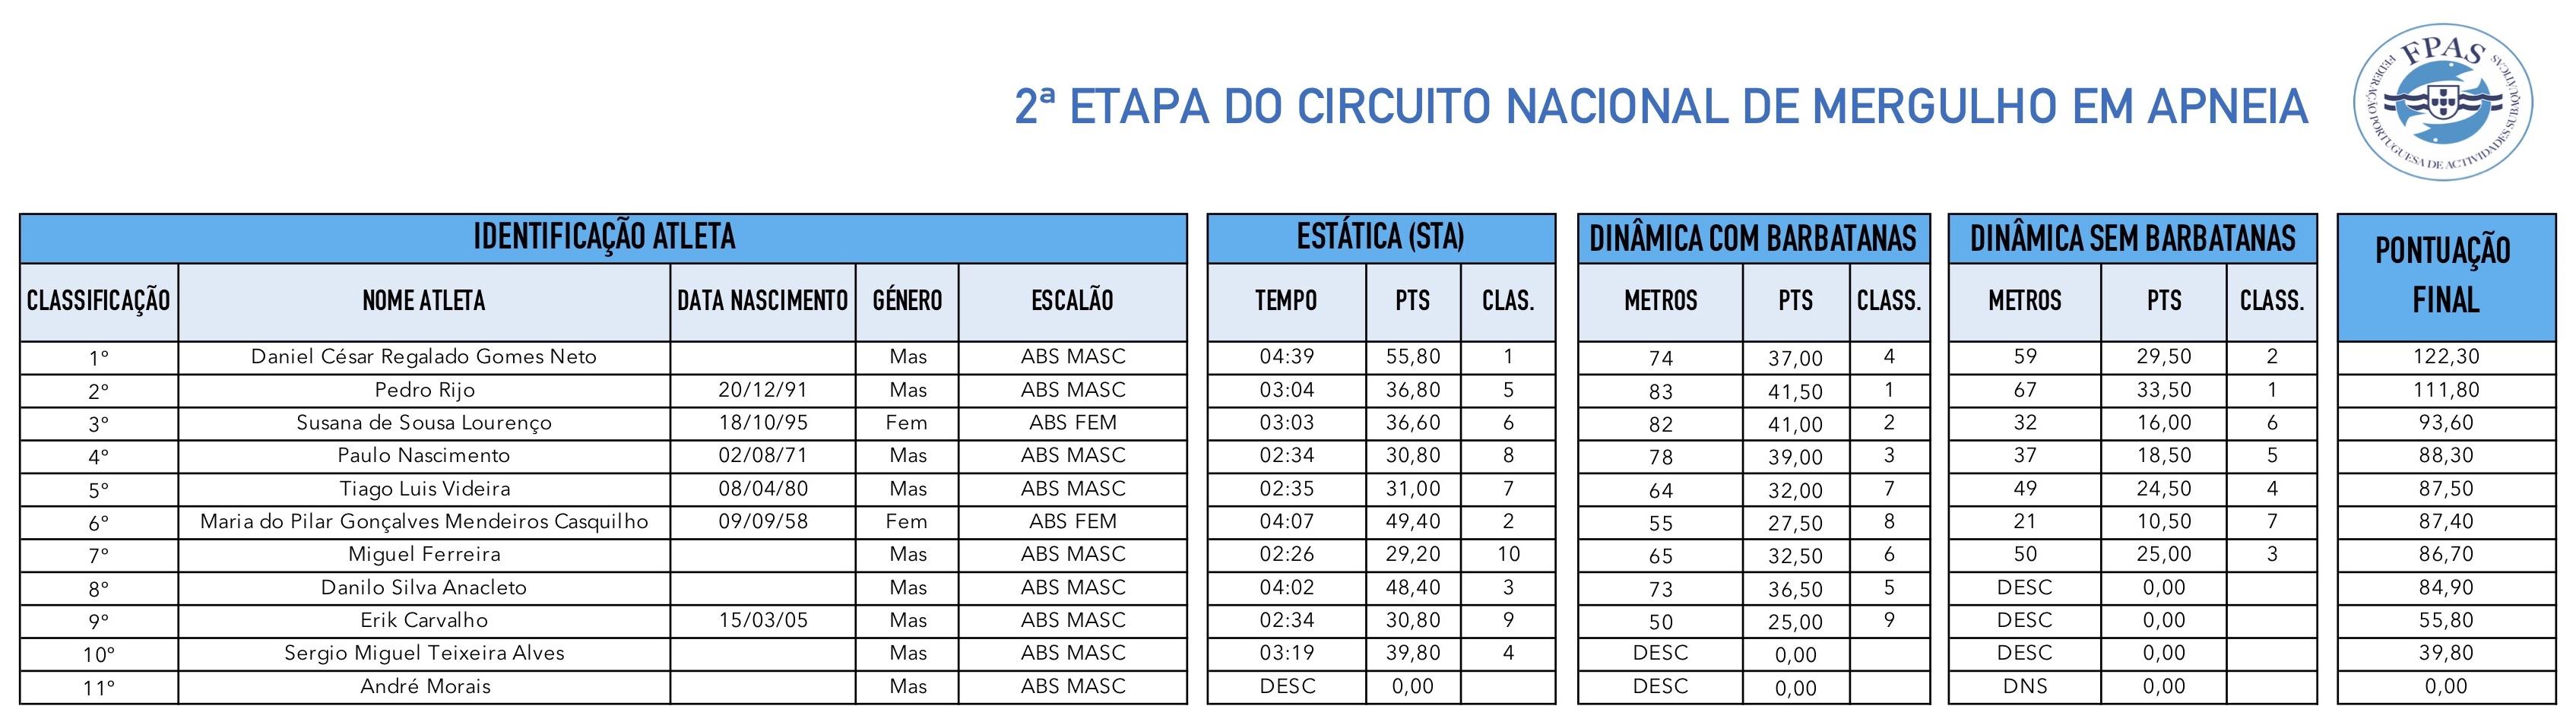 Geral_1ªEtapa_Circuito_MA_2019.jpg